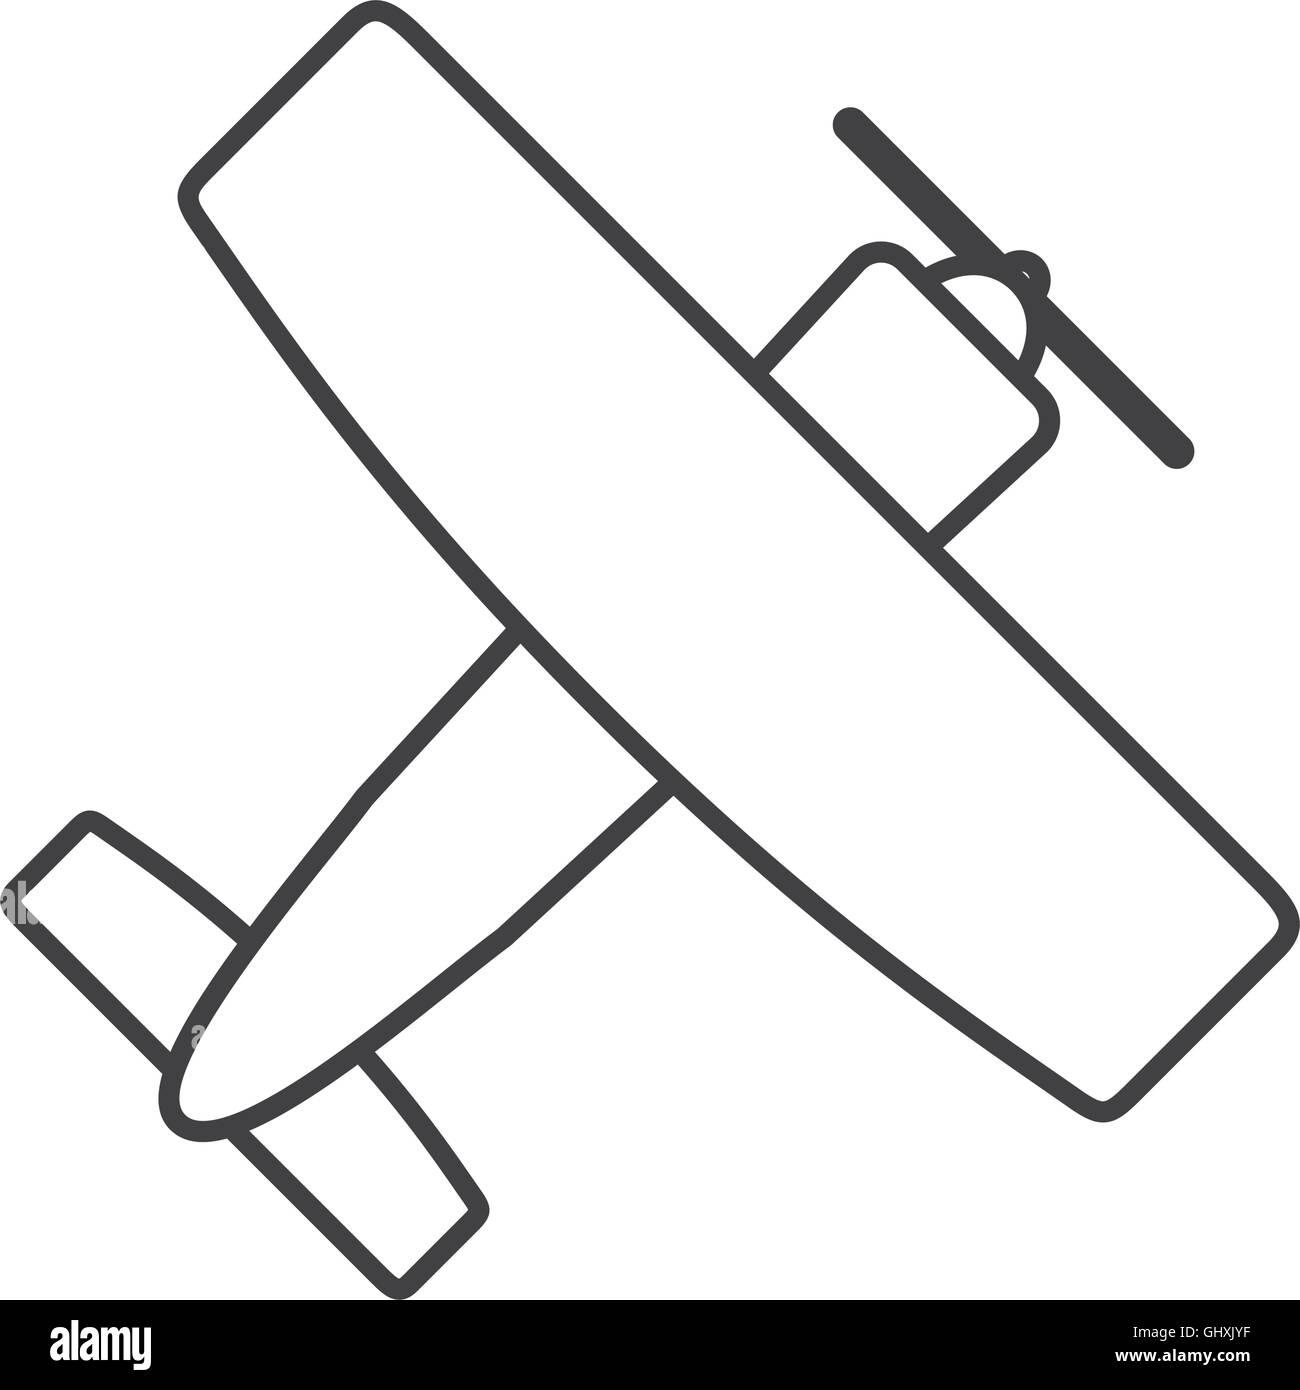 aerobatic or trainer airplane icon - Stock Image